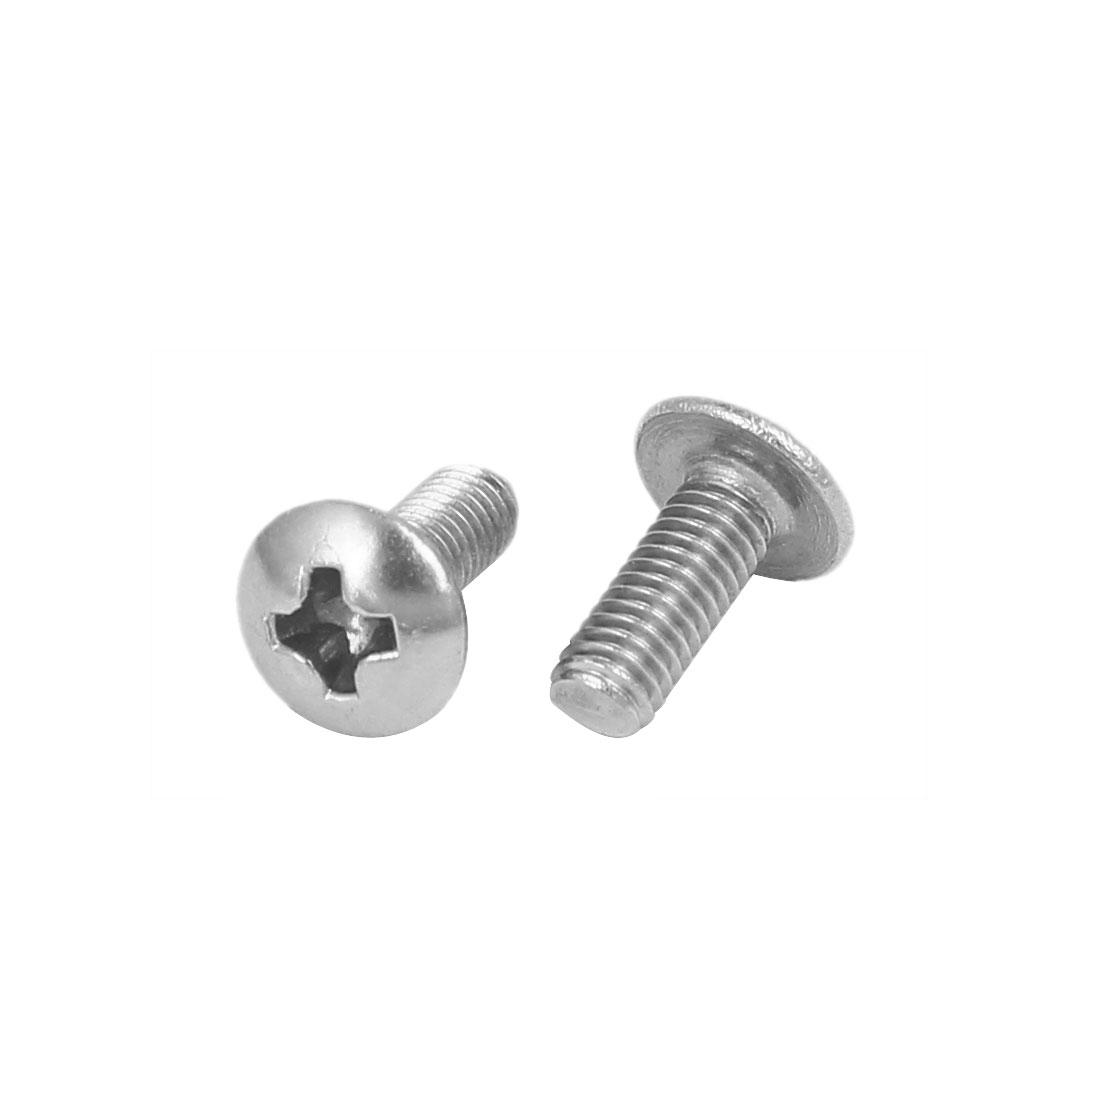 M3 x 8mm 316 Stainless Steel Truss Phillips Head Machine Screw Silver Tone 30pcs - image 1 de 2